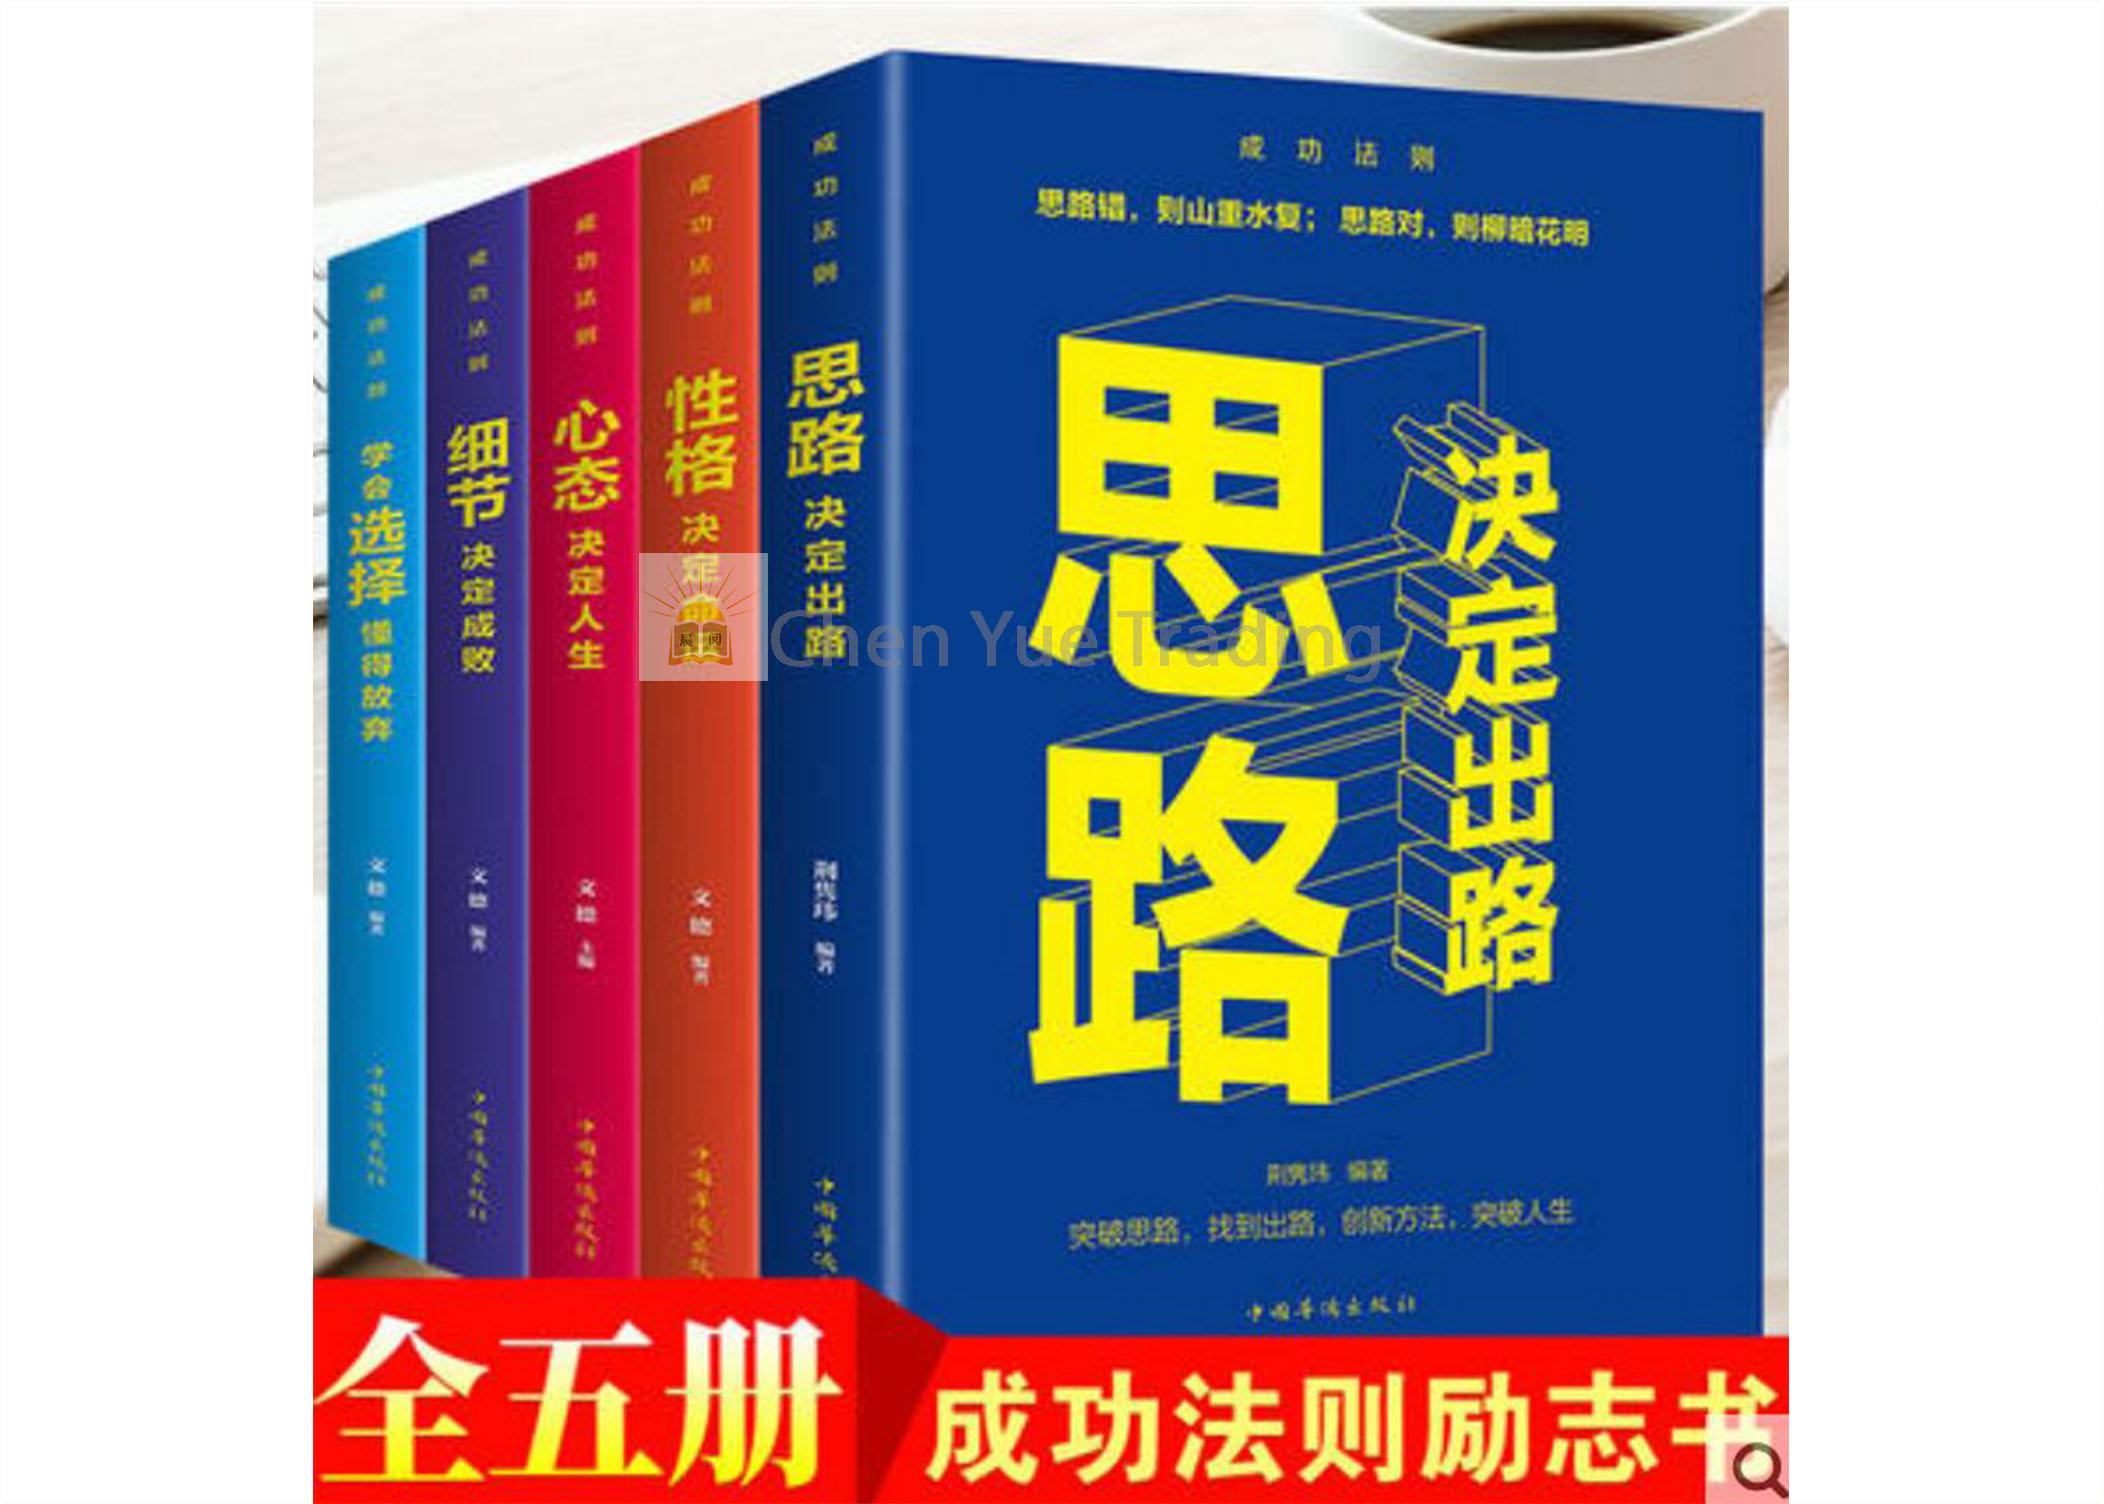 Ready Stock- Self help books 全套5本细节决定成败 + 思路决定出路 + 性格决定命运 + 心态决定人生 + 学会选择懂得放弃